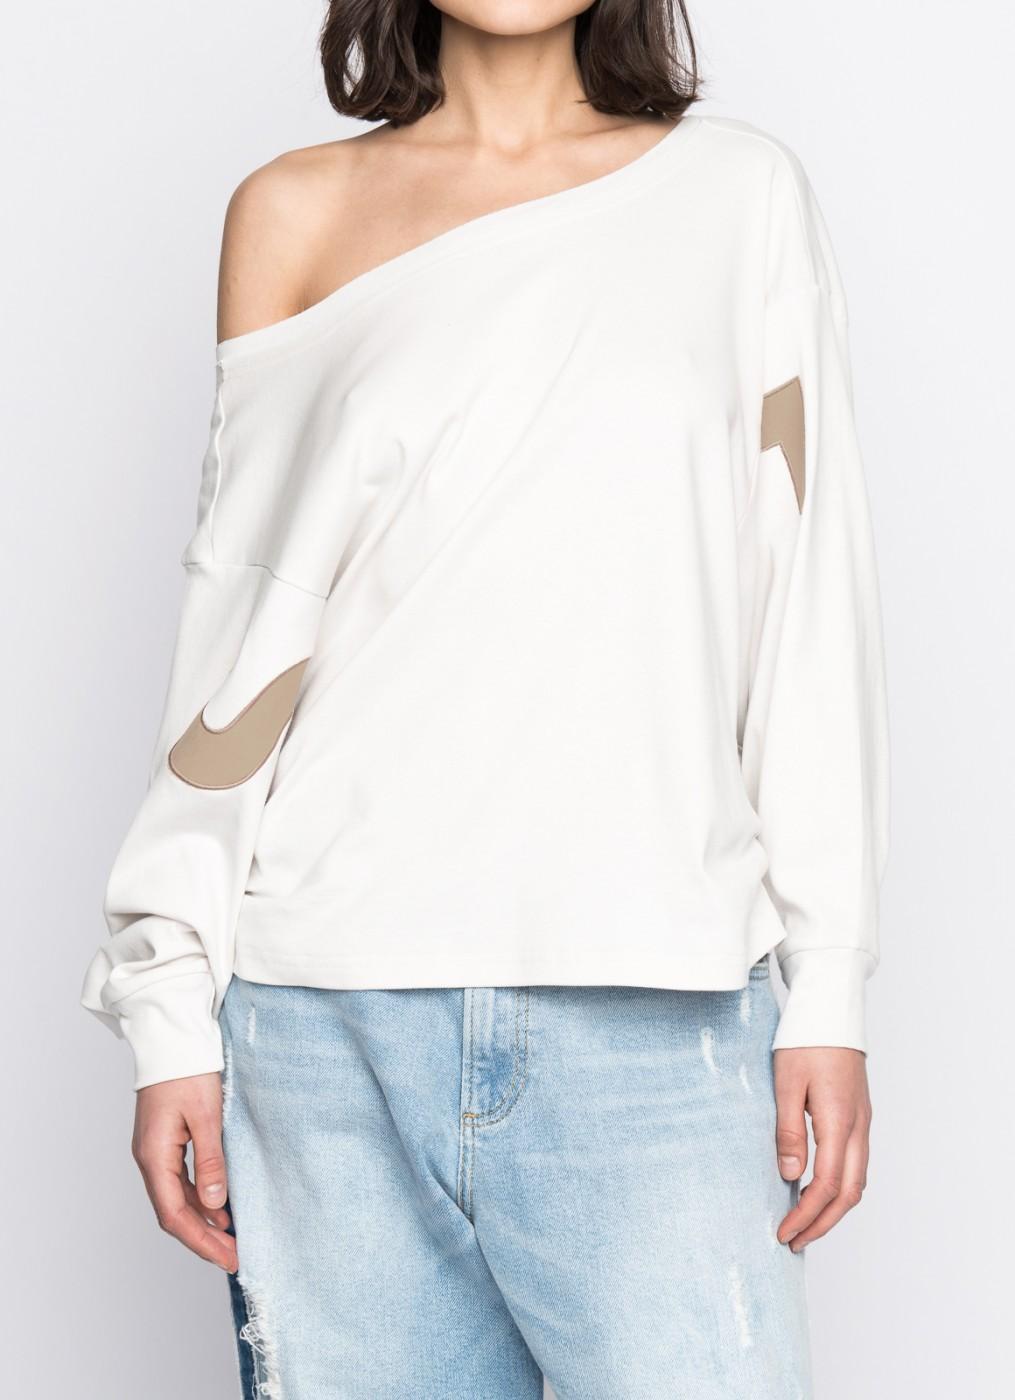 ER Daria - shirt